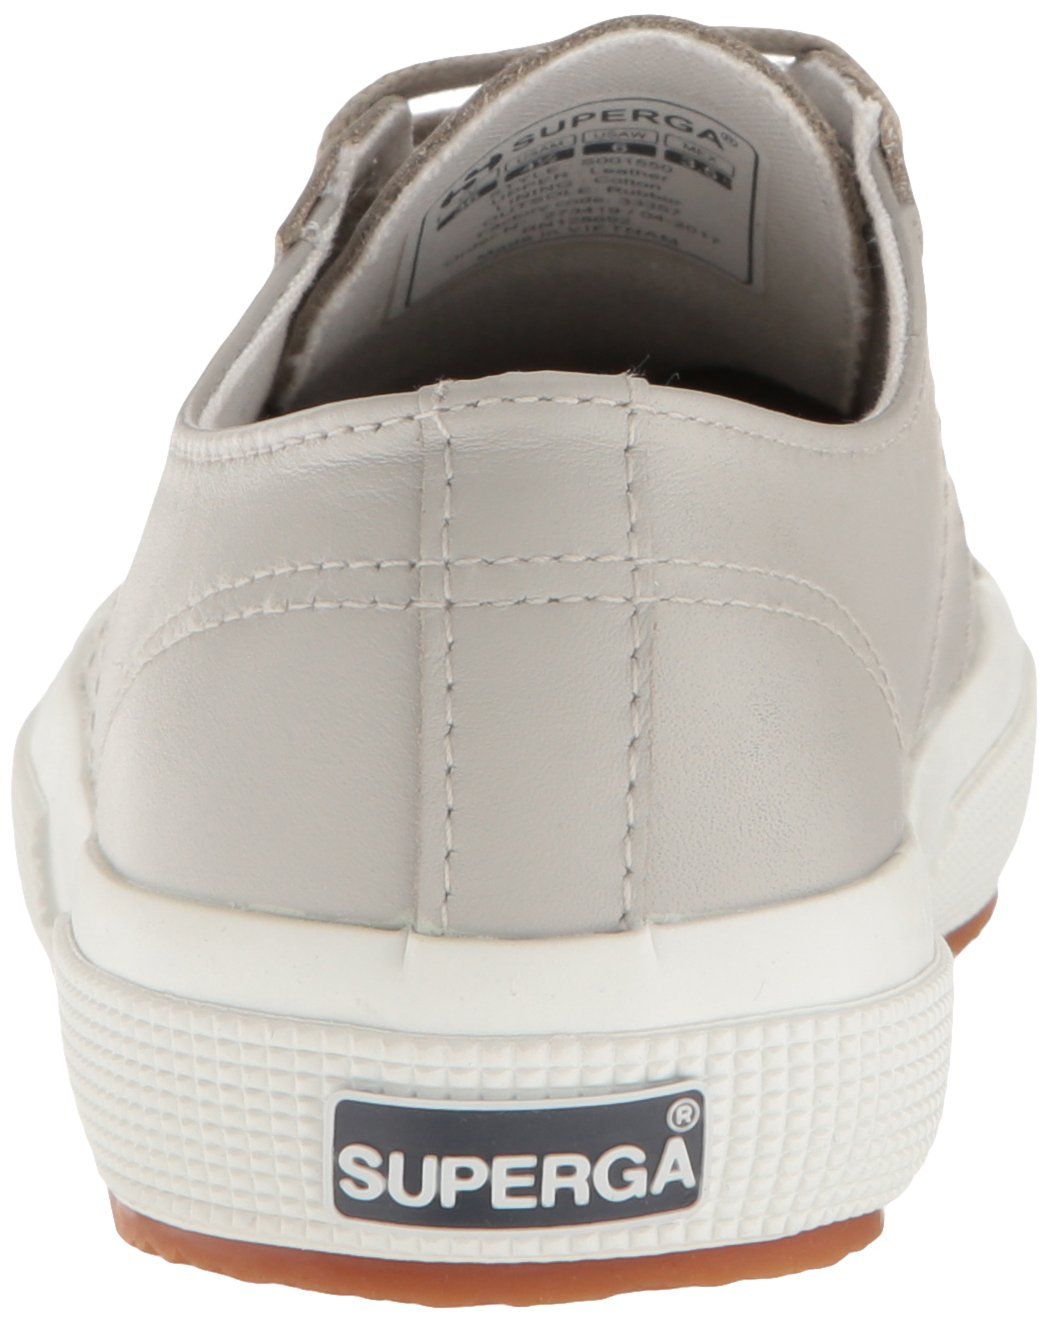 Superga Women's 2750 Fglu Wt Fashion Sneaker B01MTALPM9 39.5 M EU / 8.5 B(M) US Light Grey